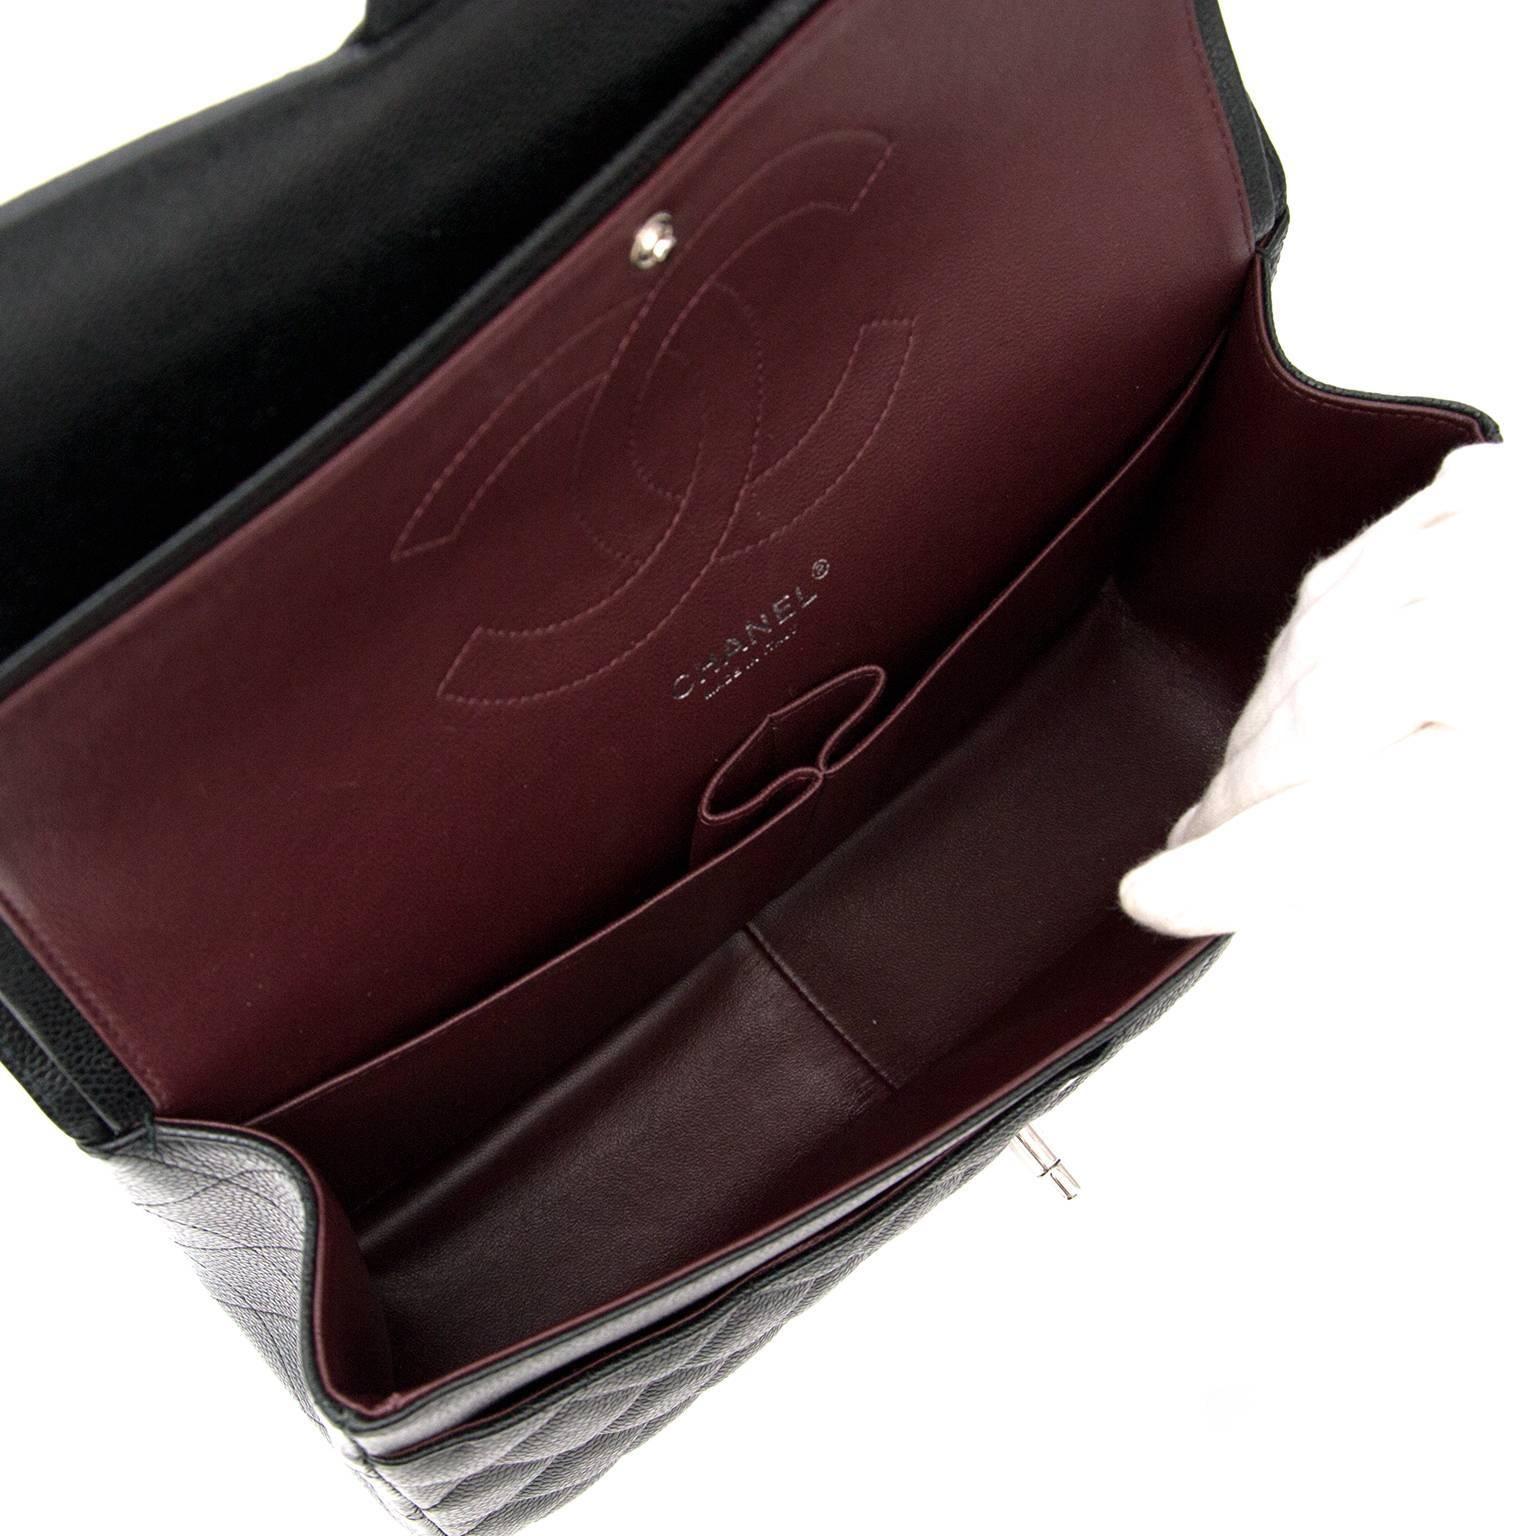 38a76951b3b2b6 Chanel Jumbo Classic Flap Bag at 1stdibs